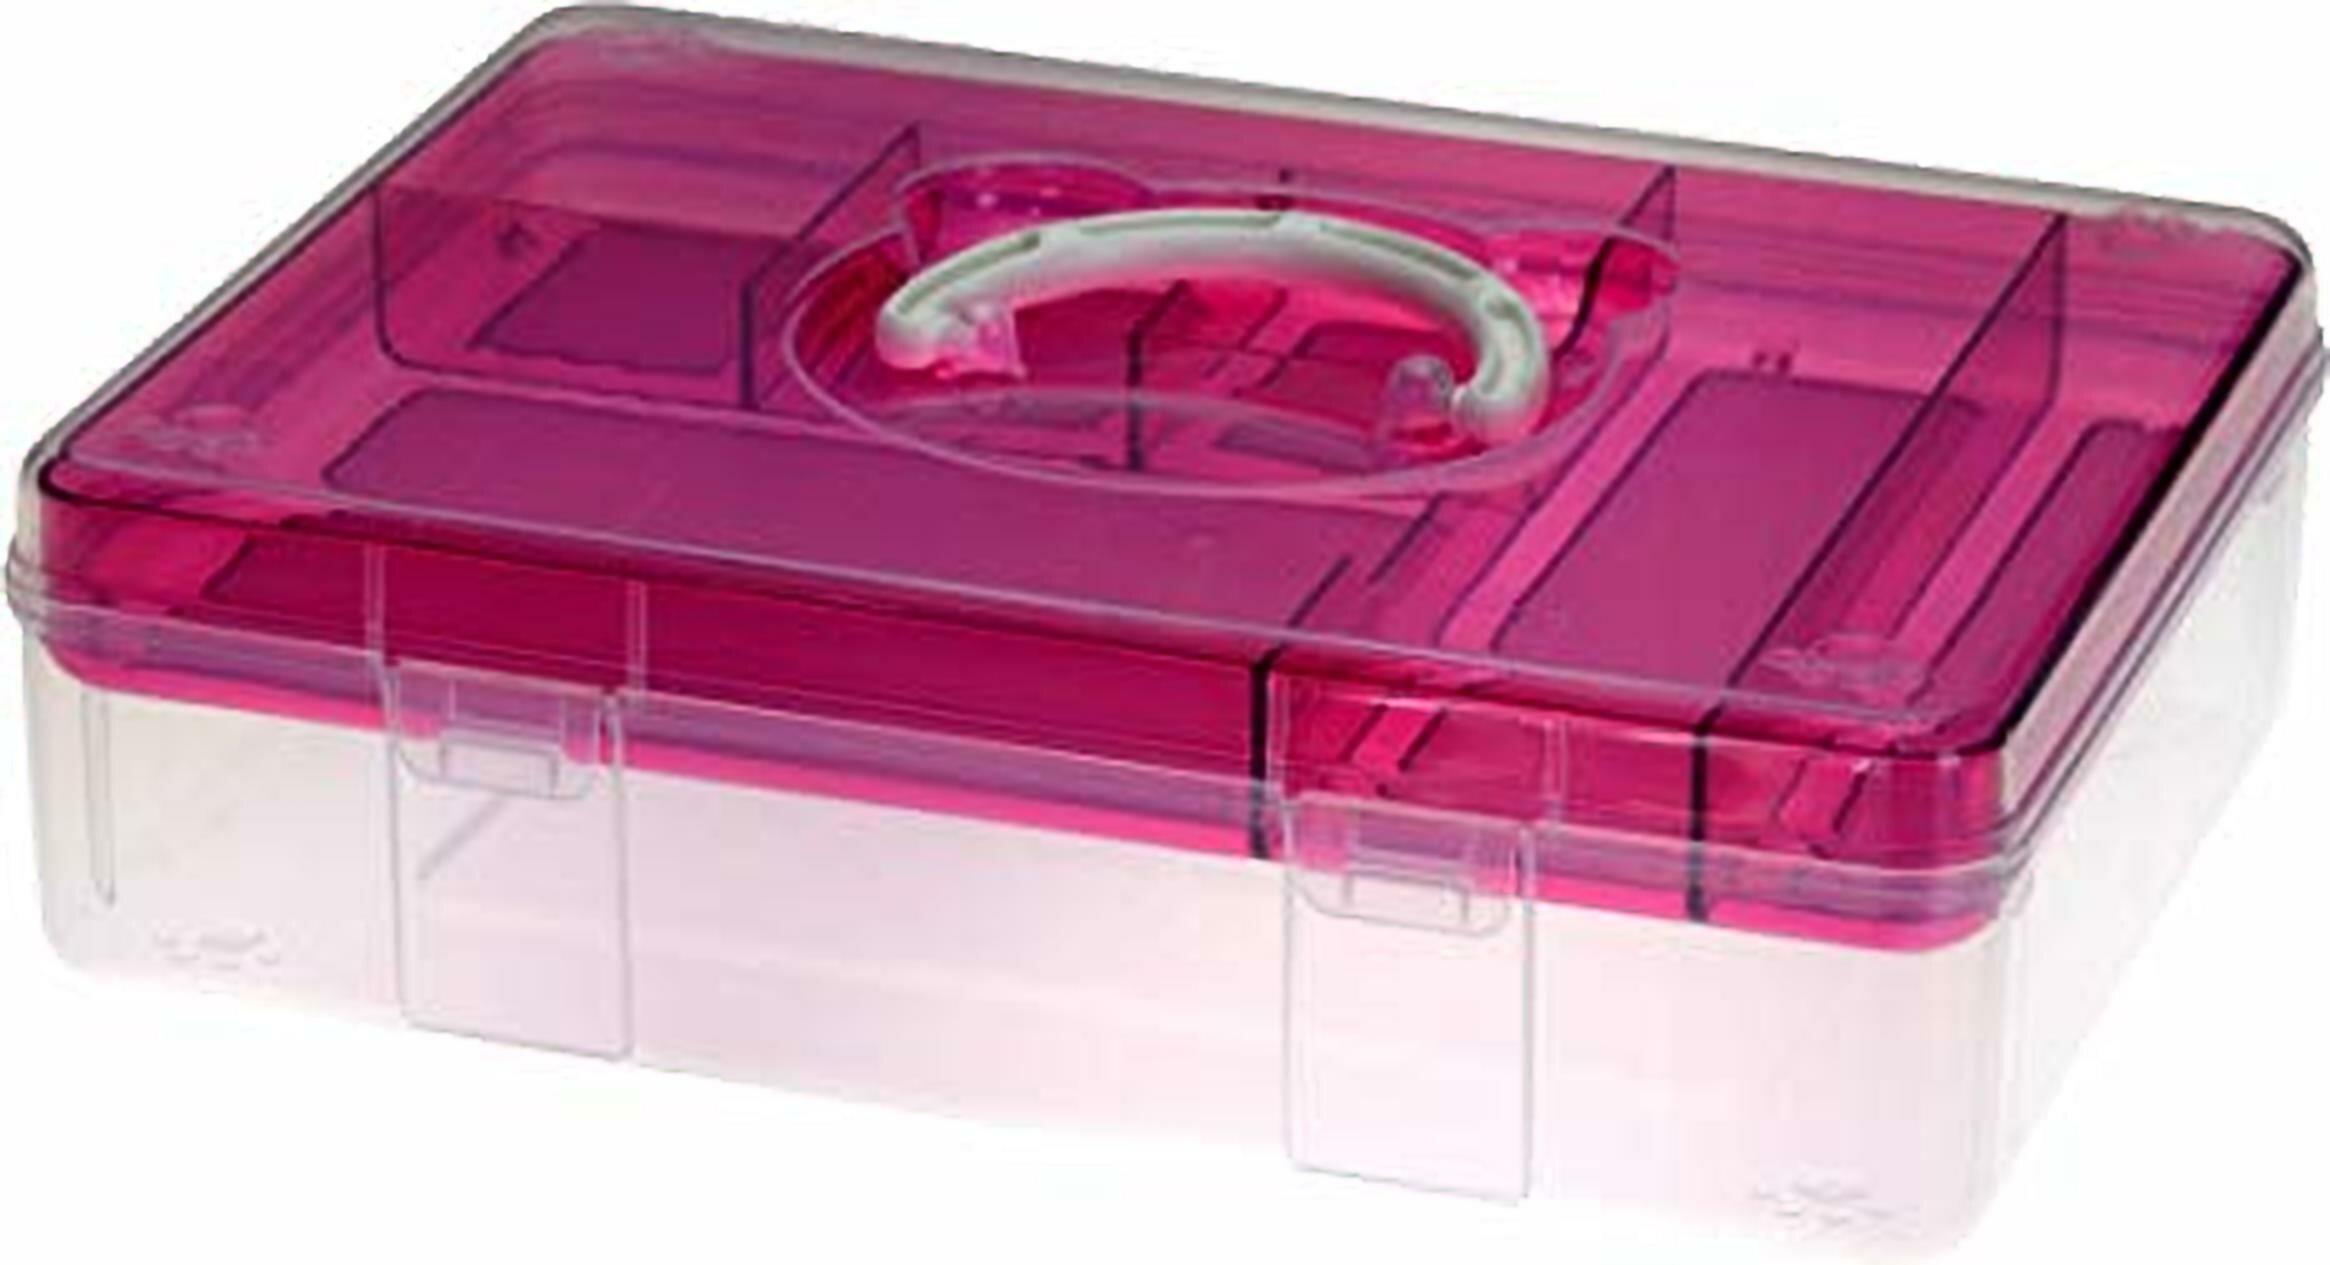 Ebern Designs Lorain Portable Desk Organizer Set Wayfair